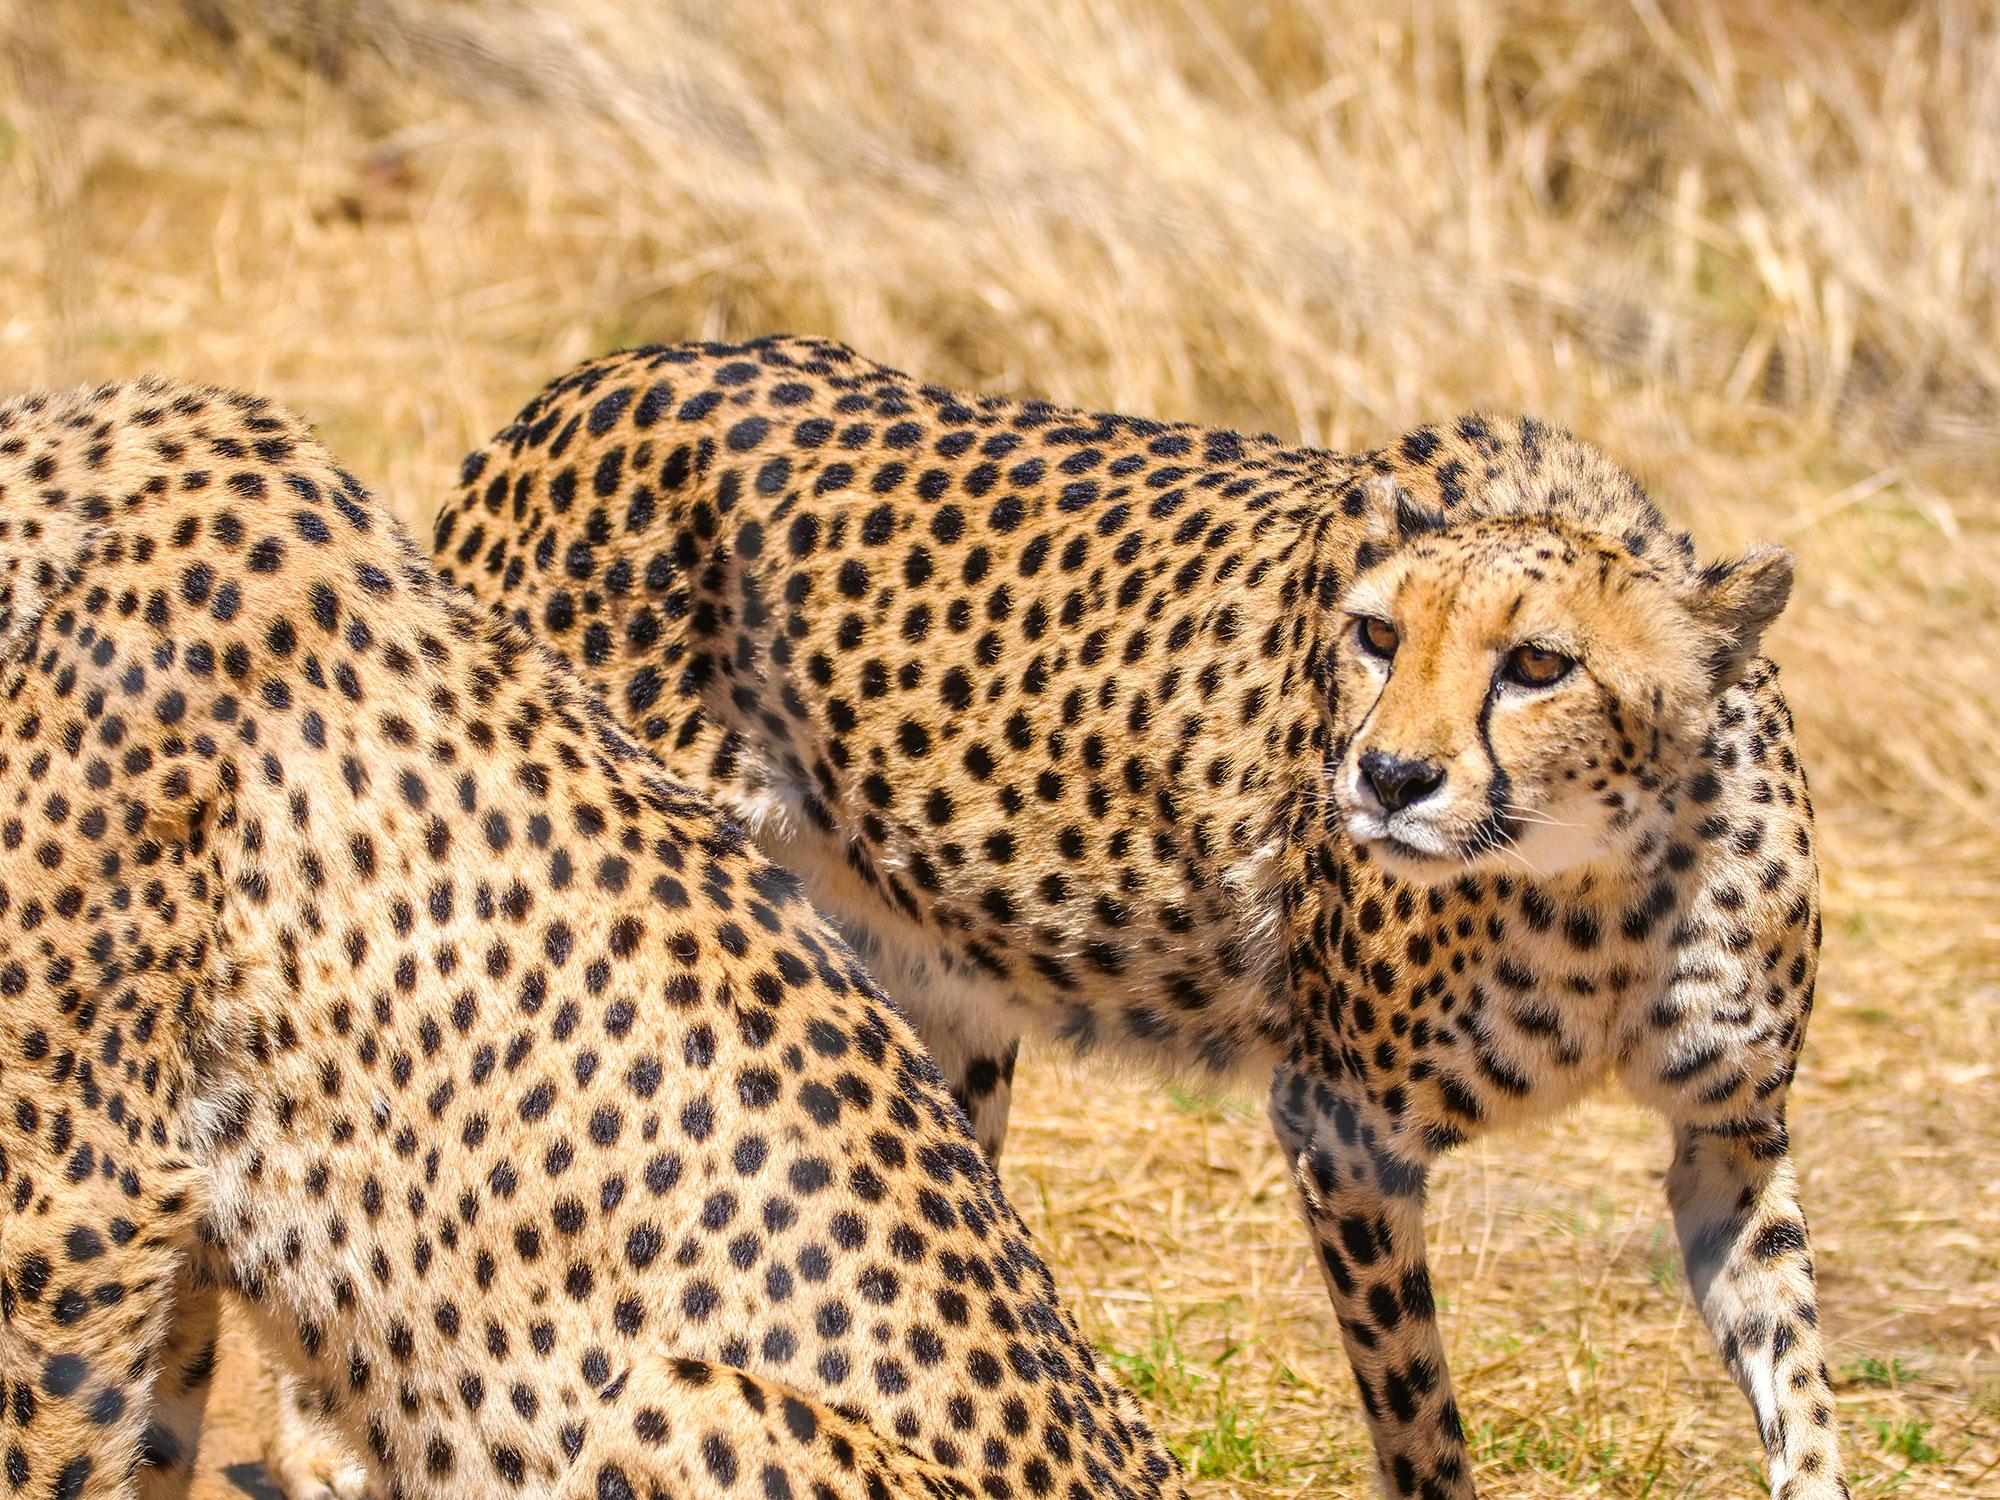 Cheetahs at N/a'an ku sê (Naankuse) Wildlife Sanctuary in Namibia, Africa